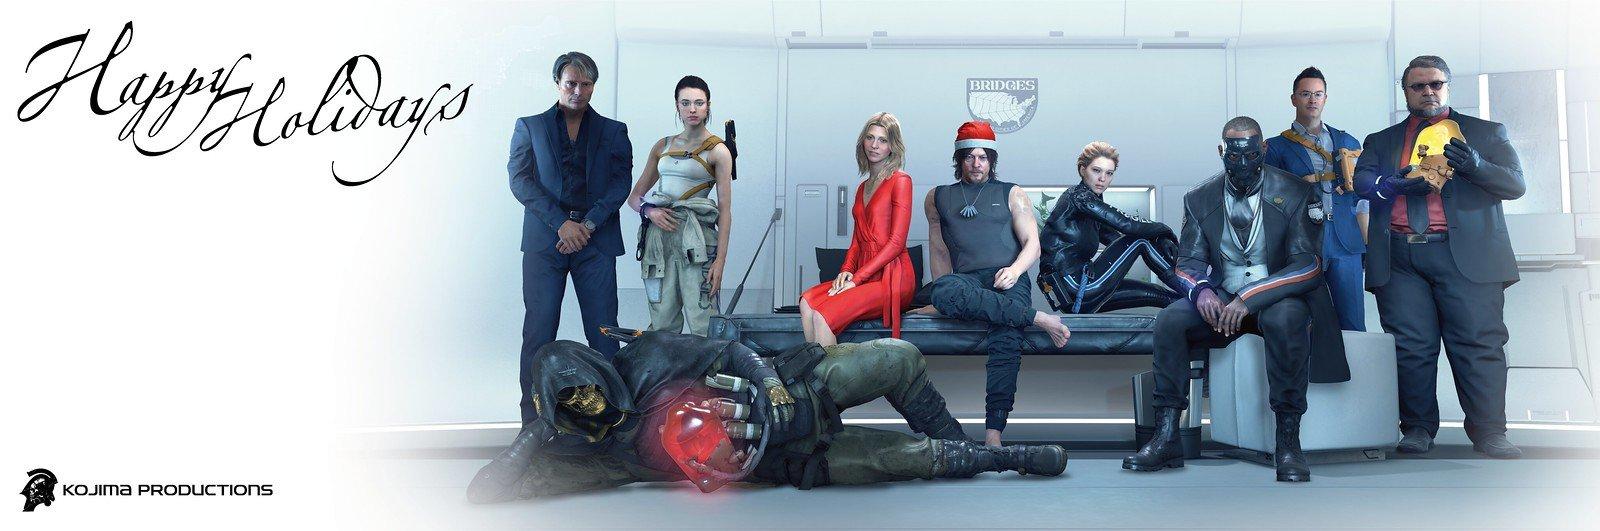 Kojima Productions Happy Holidays wallpaper